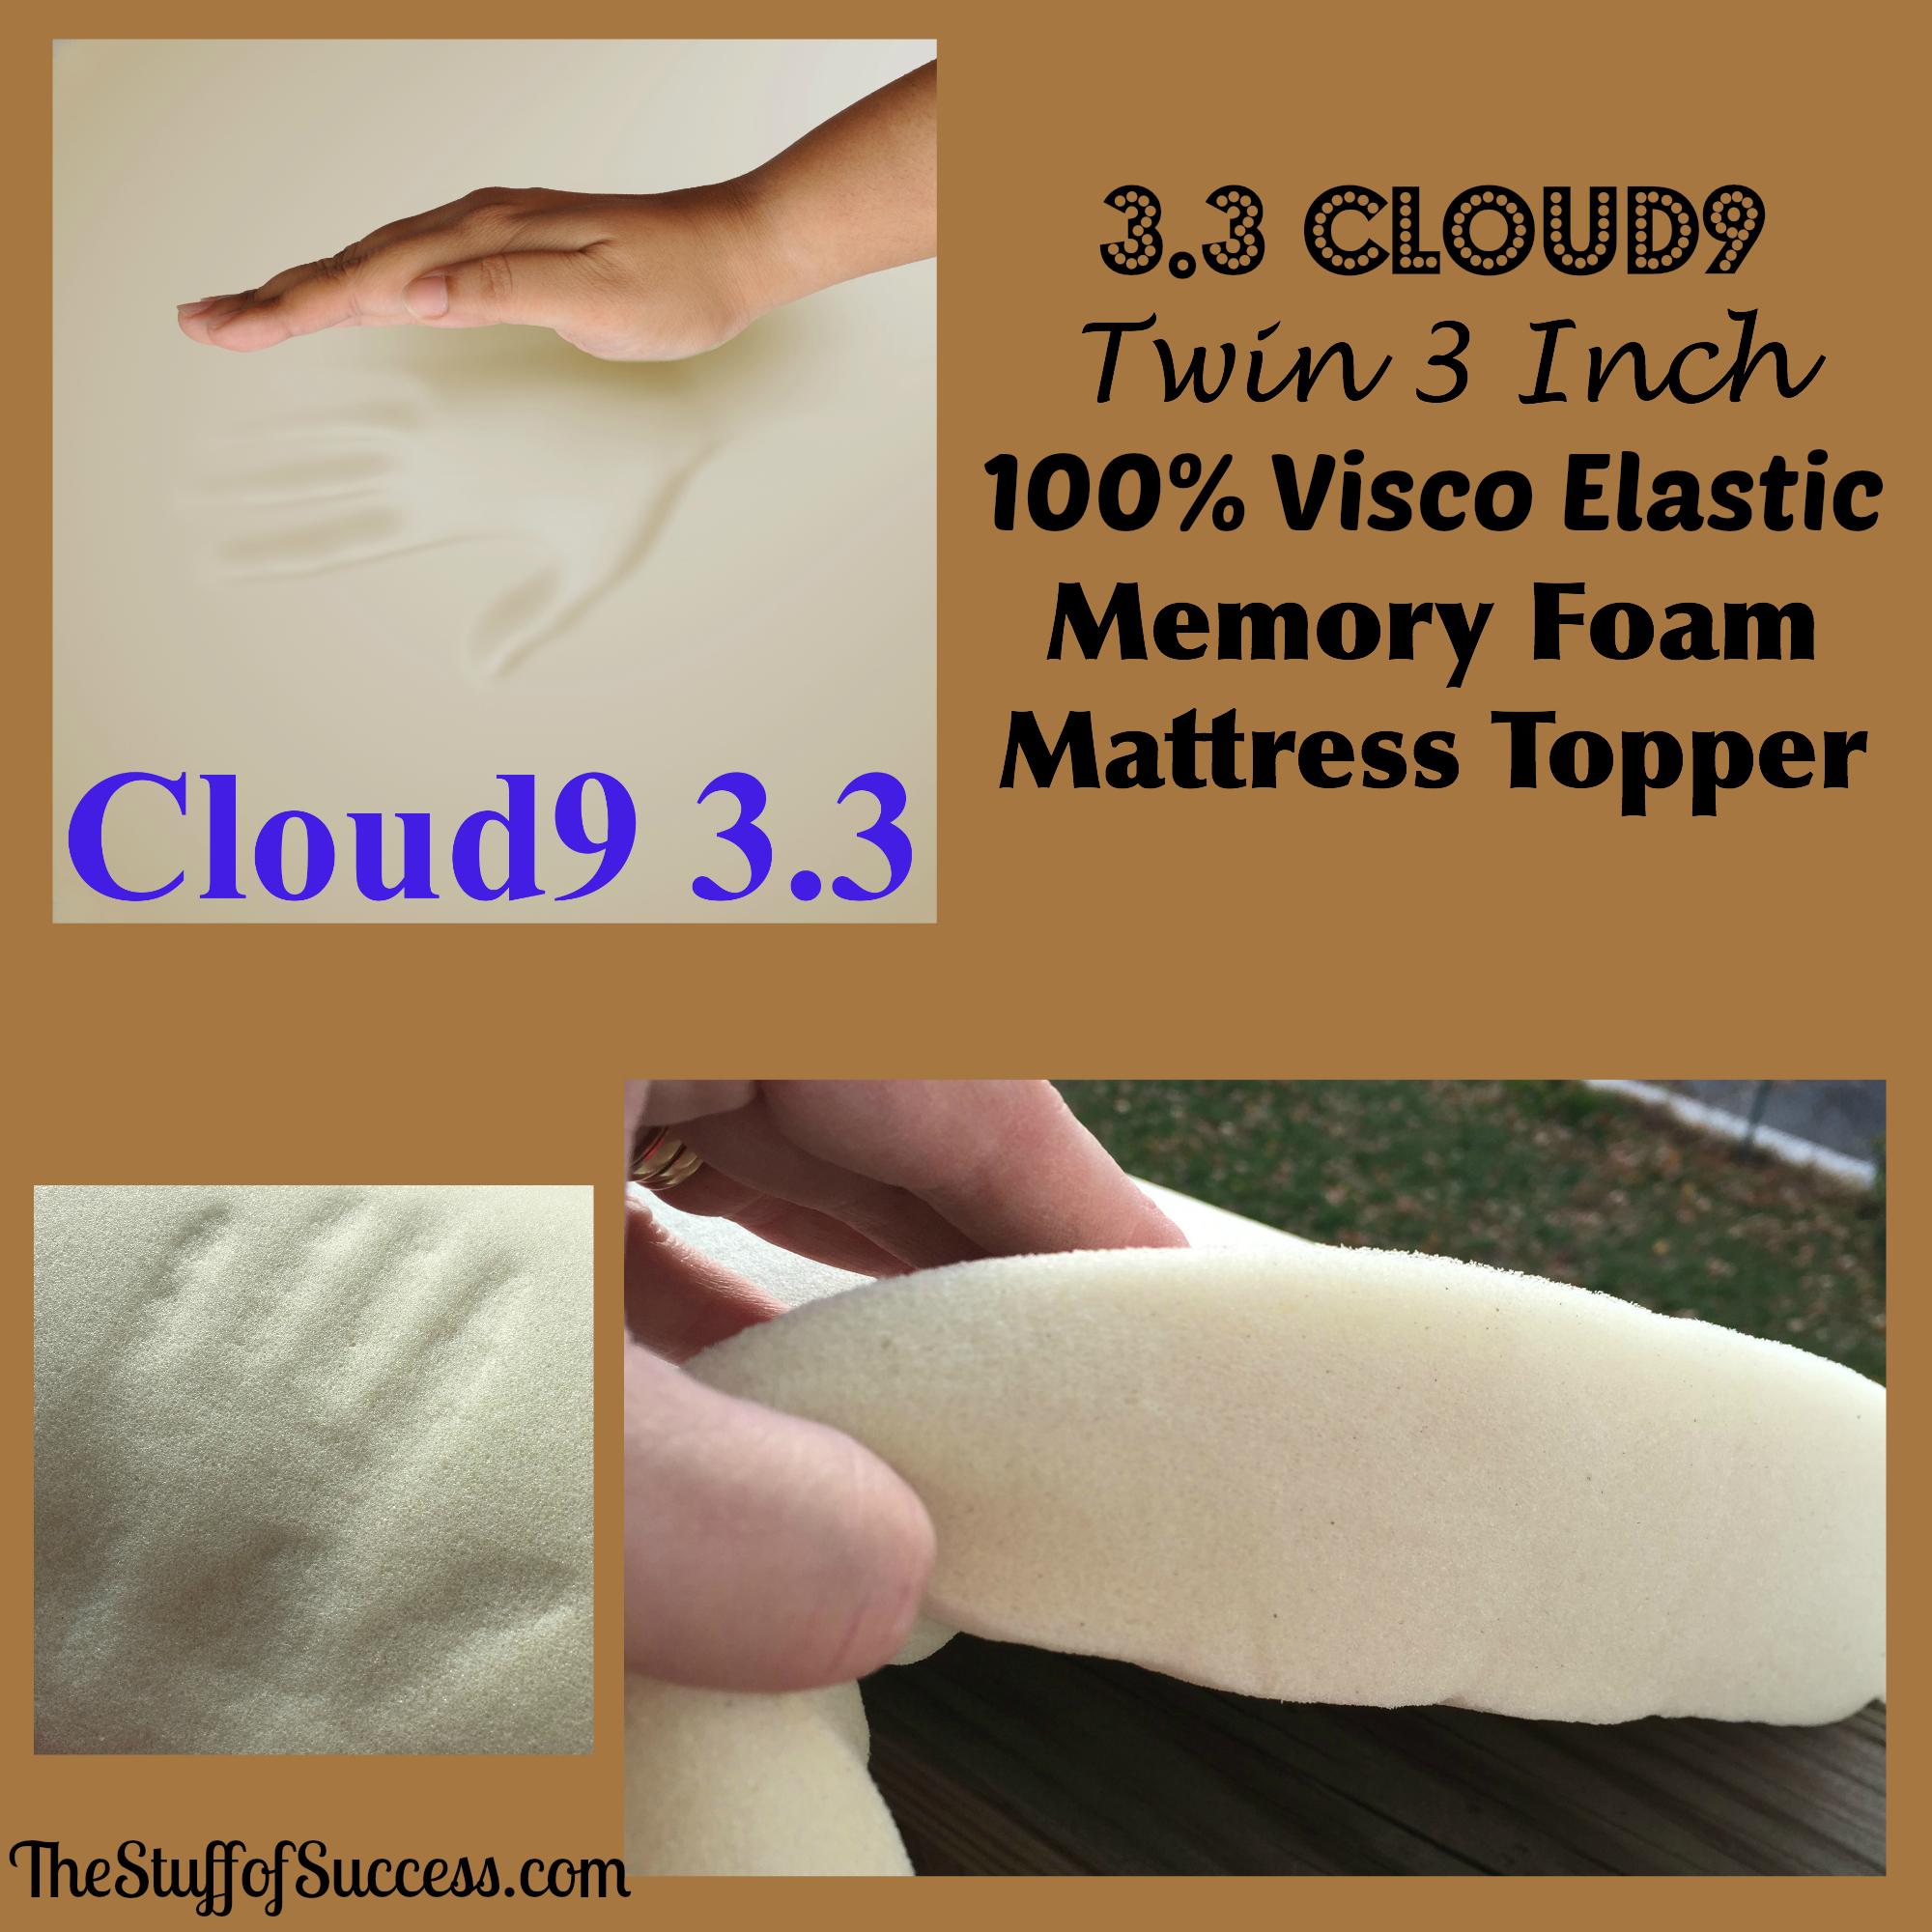 3 3 Cloud9 Twin 3 Inch 100 Visco Elastic Memory Foam Mattress Topper